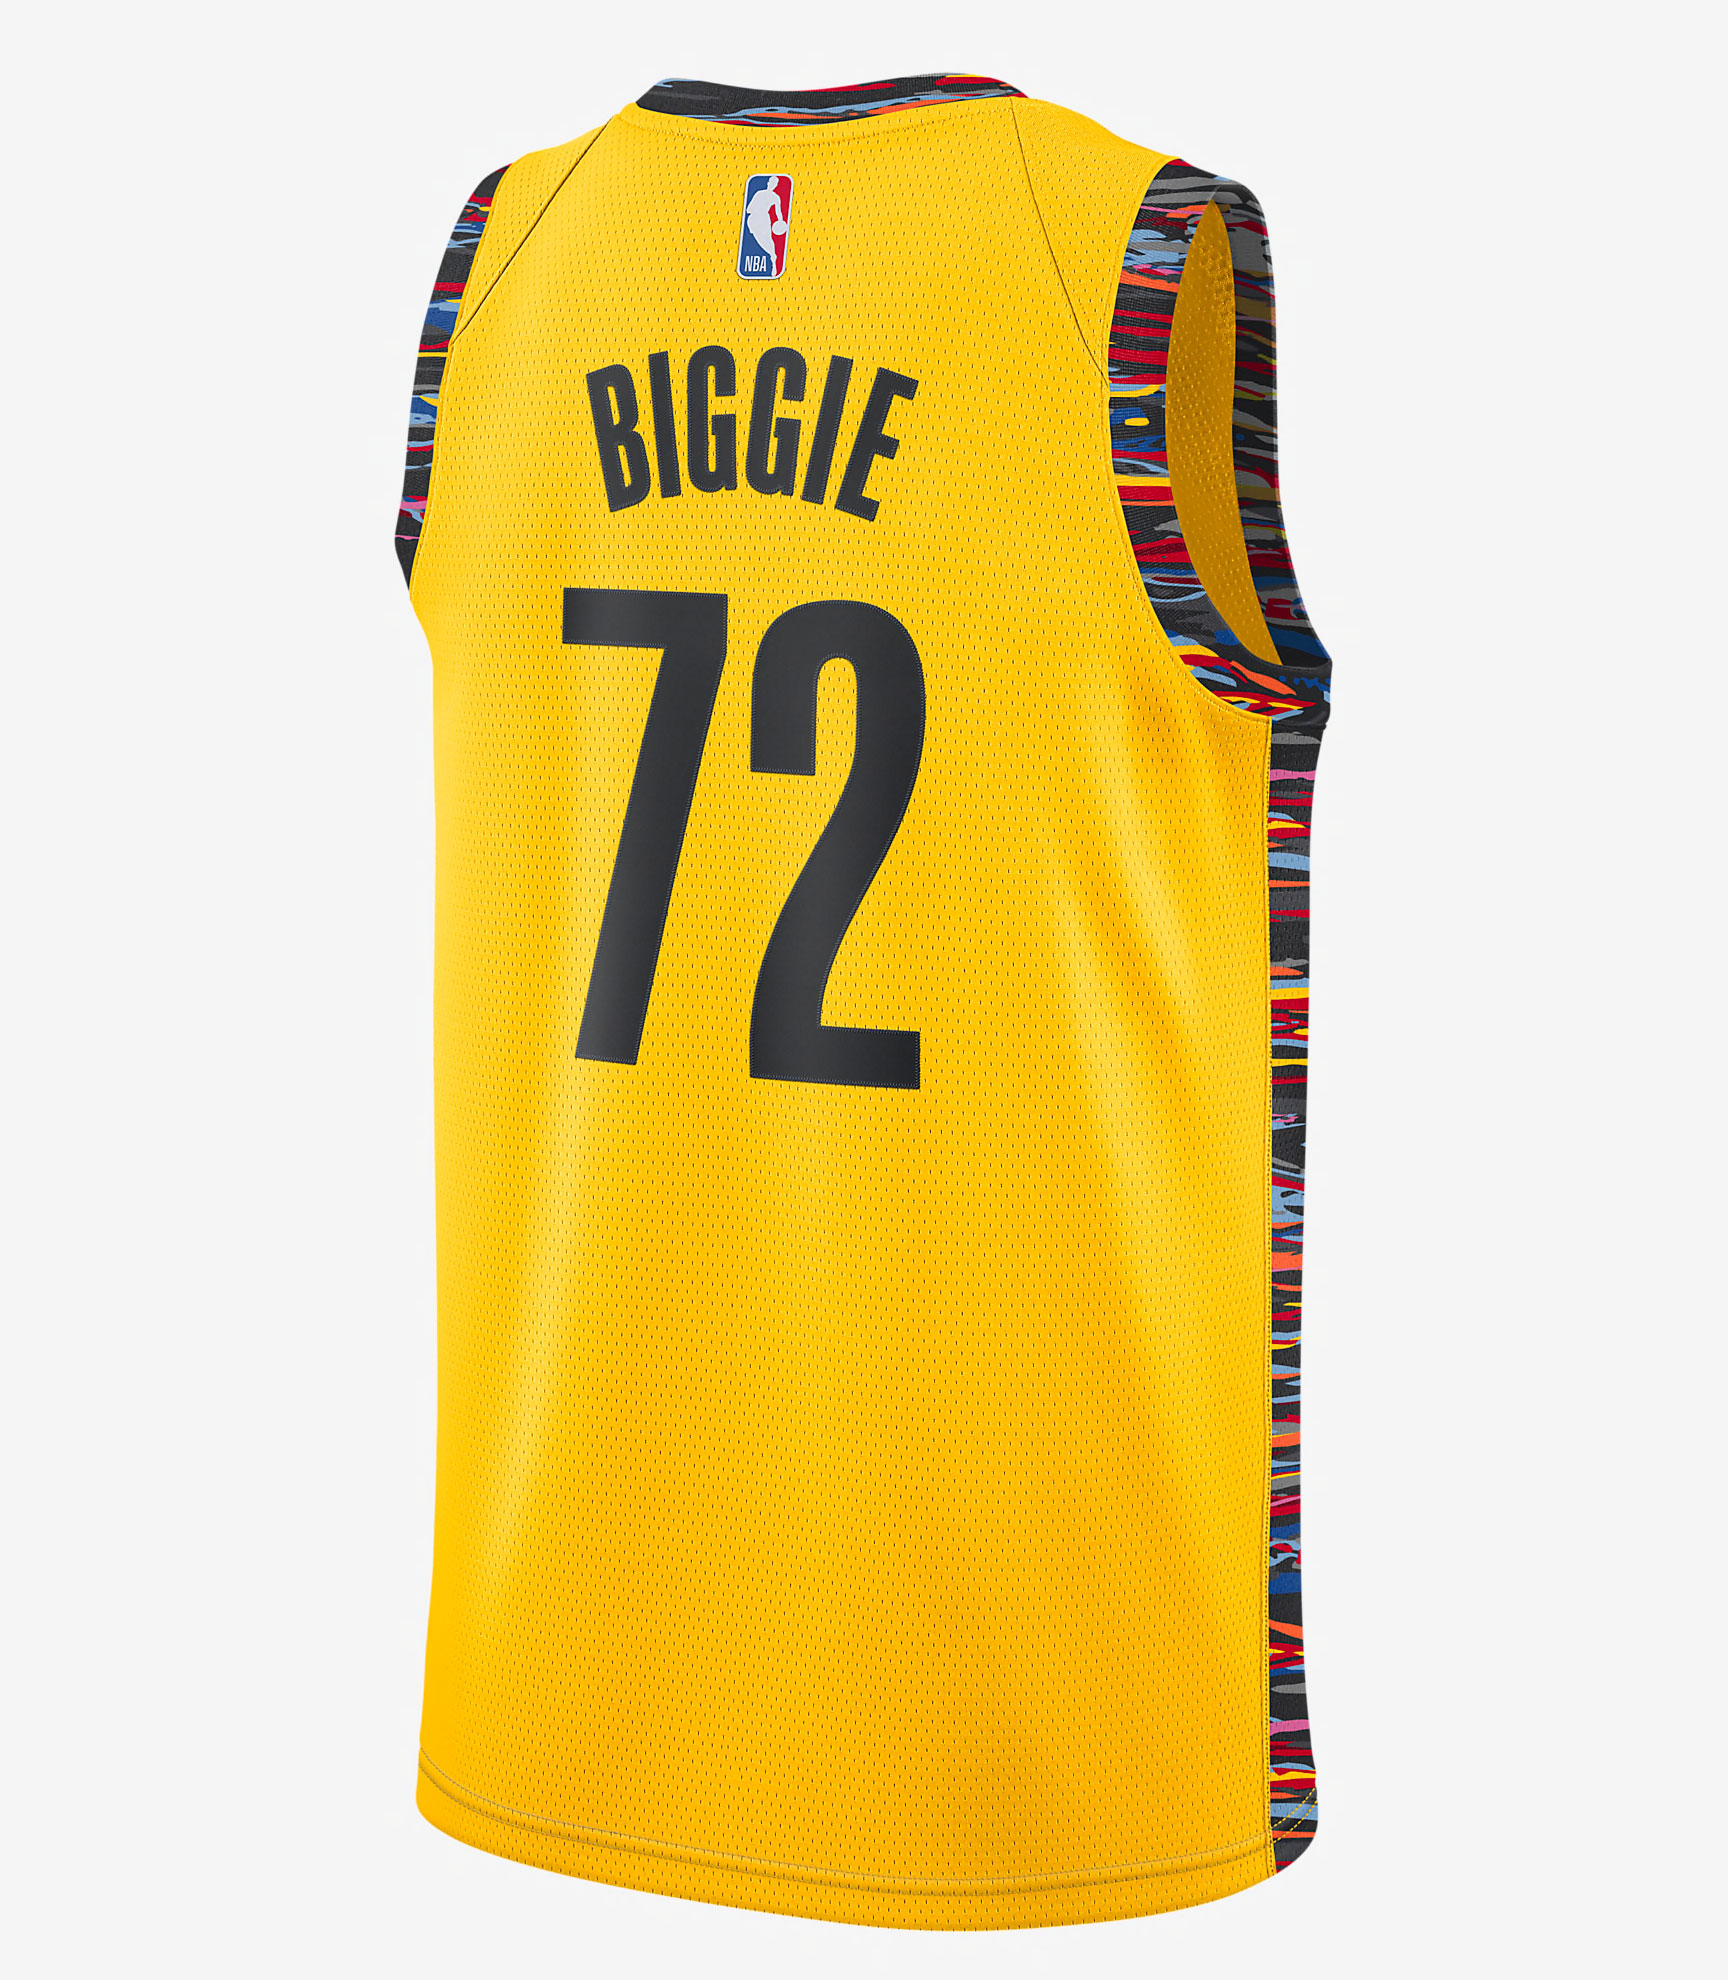 Nike Biggie Nets Yellow Jersey X Sneakers To Match Sneakerfits Com